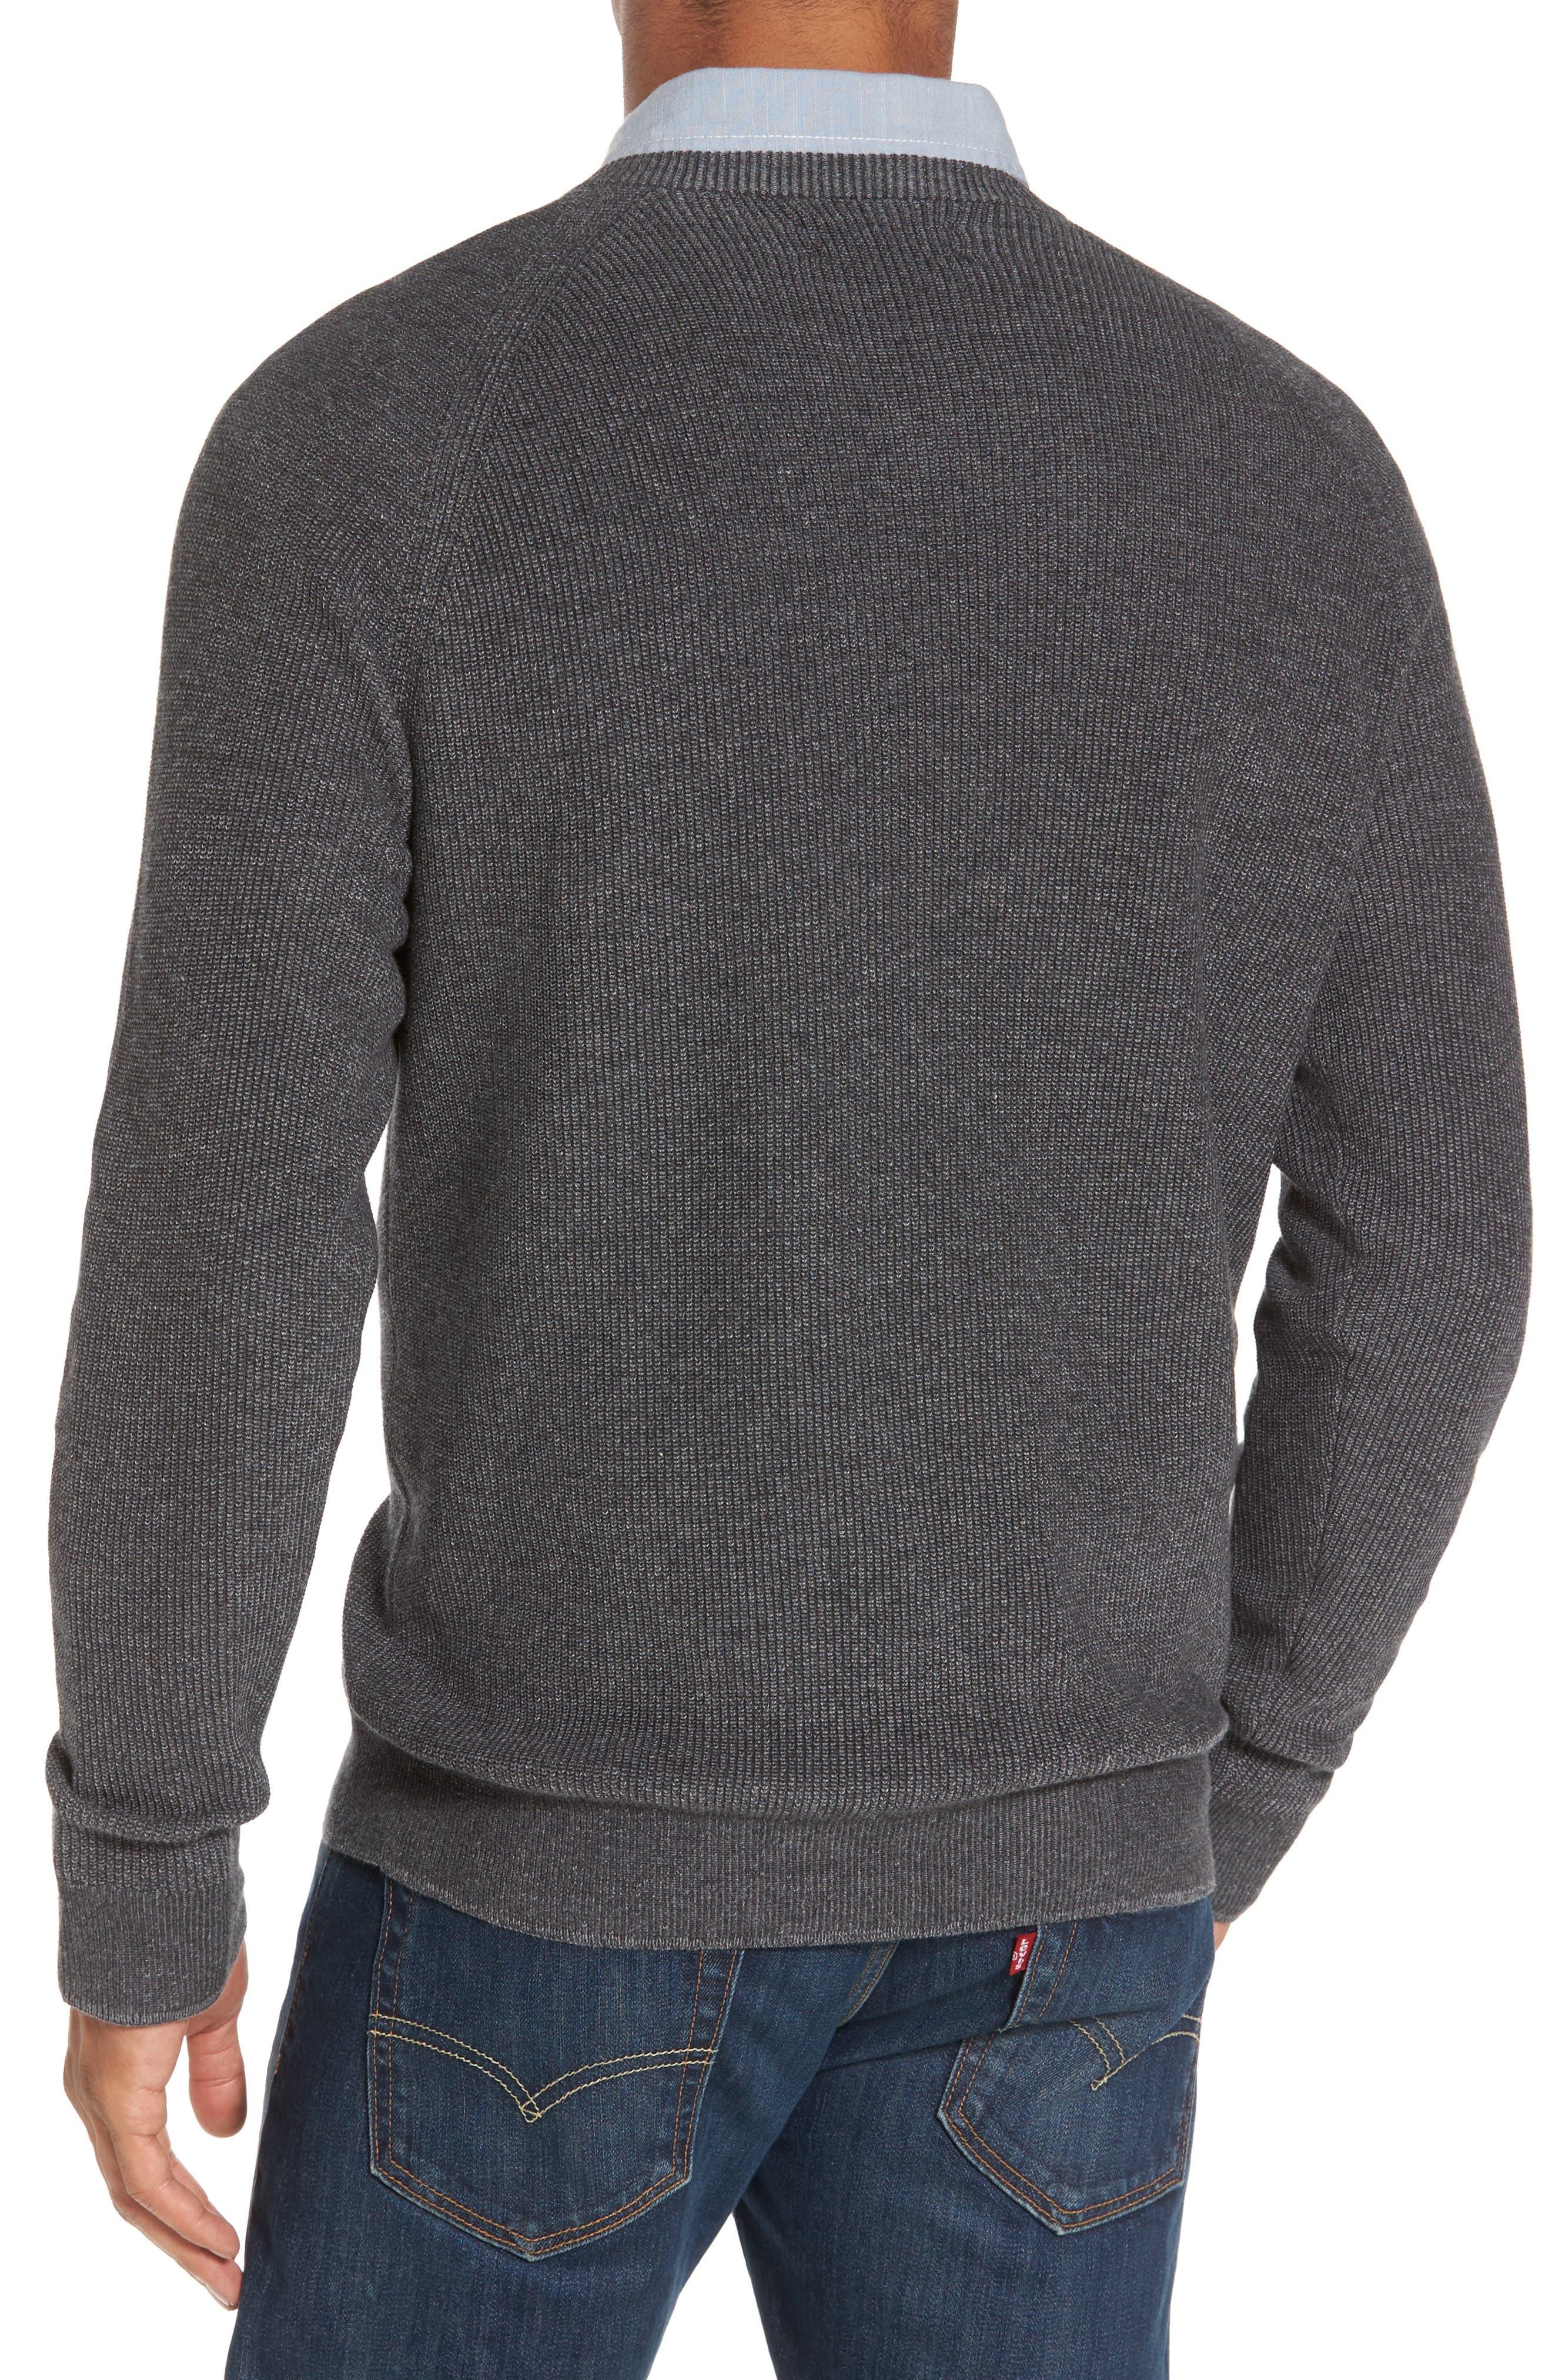 Supima<sup>®</sup> Cotton V-Neck Sweater,                             Alternate thumbnail 2, color,                             021